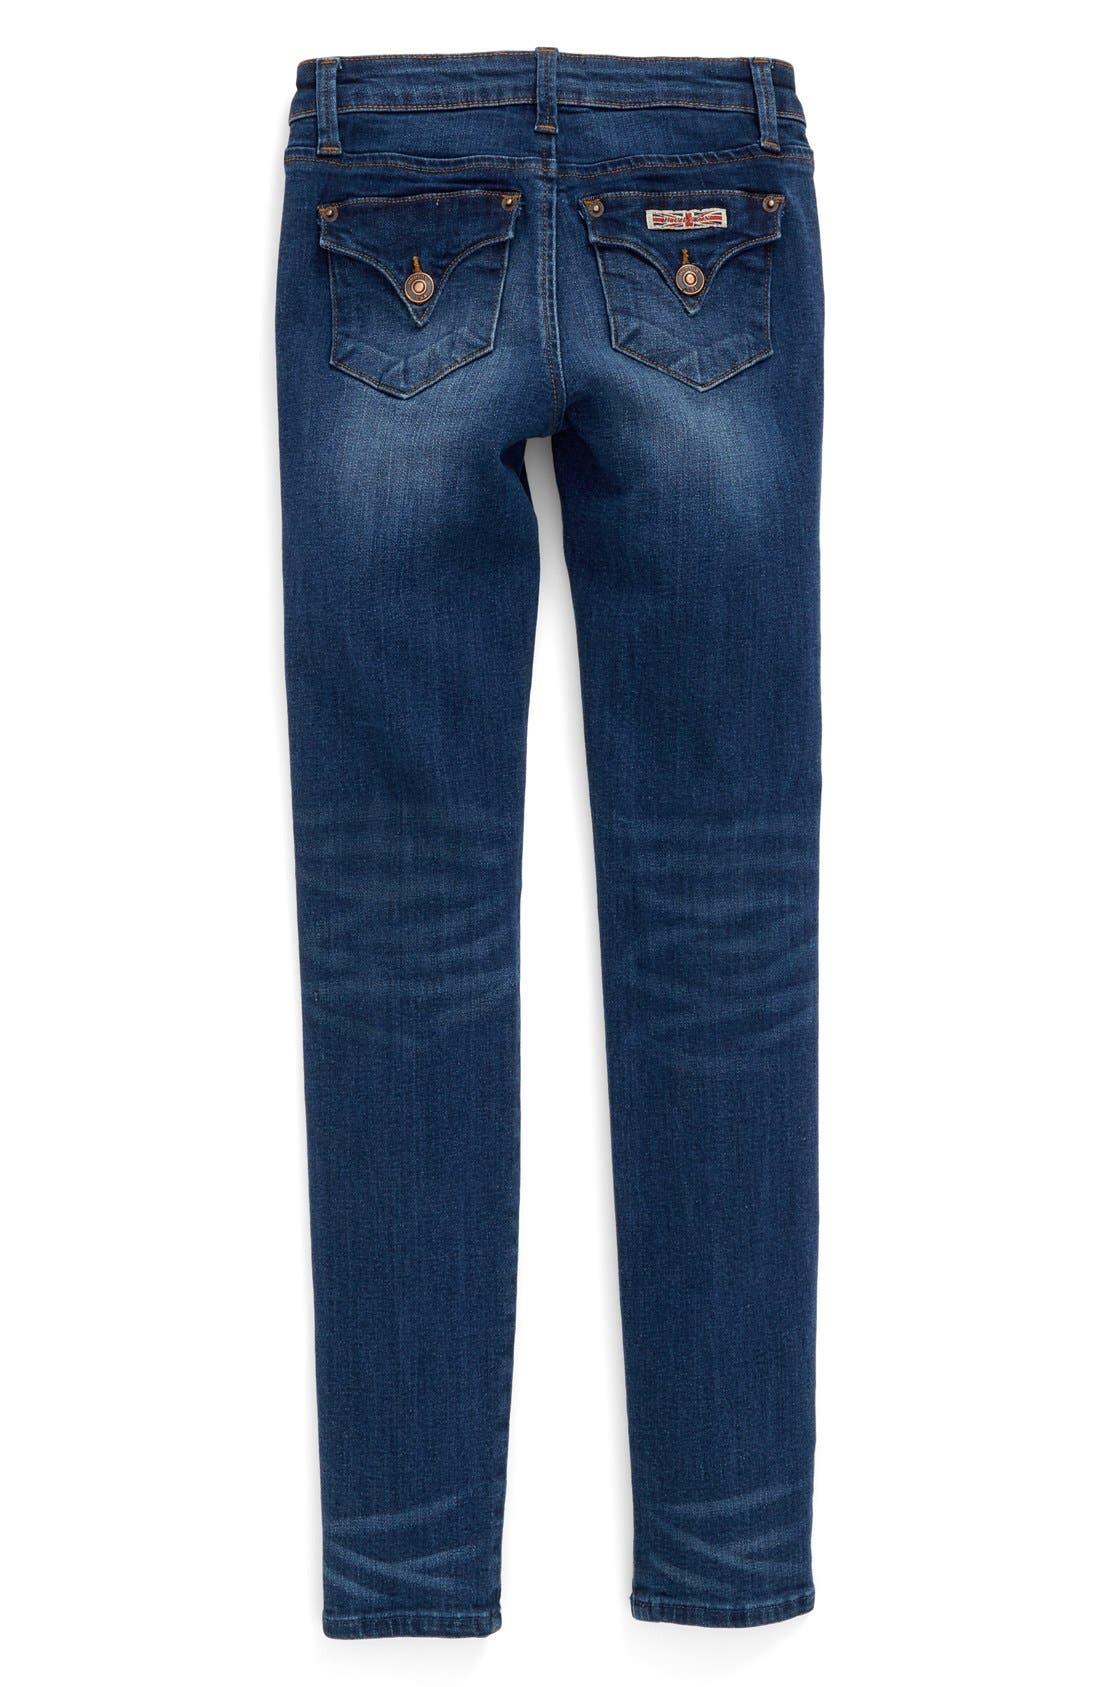 'Collin' Skinny Jeans,                             Alternate thumbnail 3, color,                             484